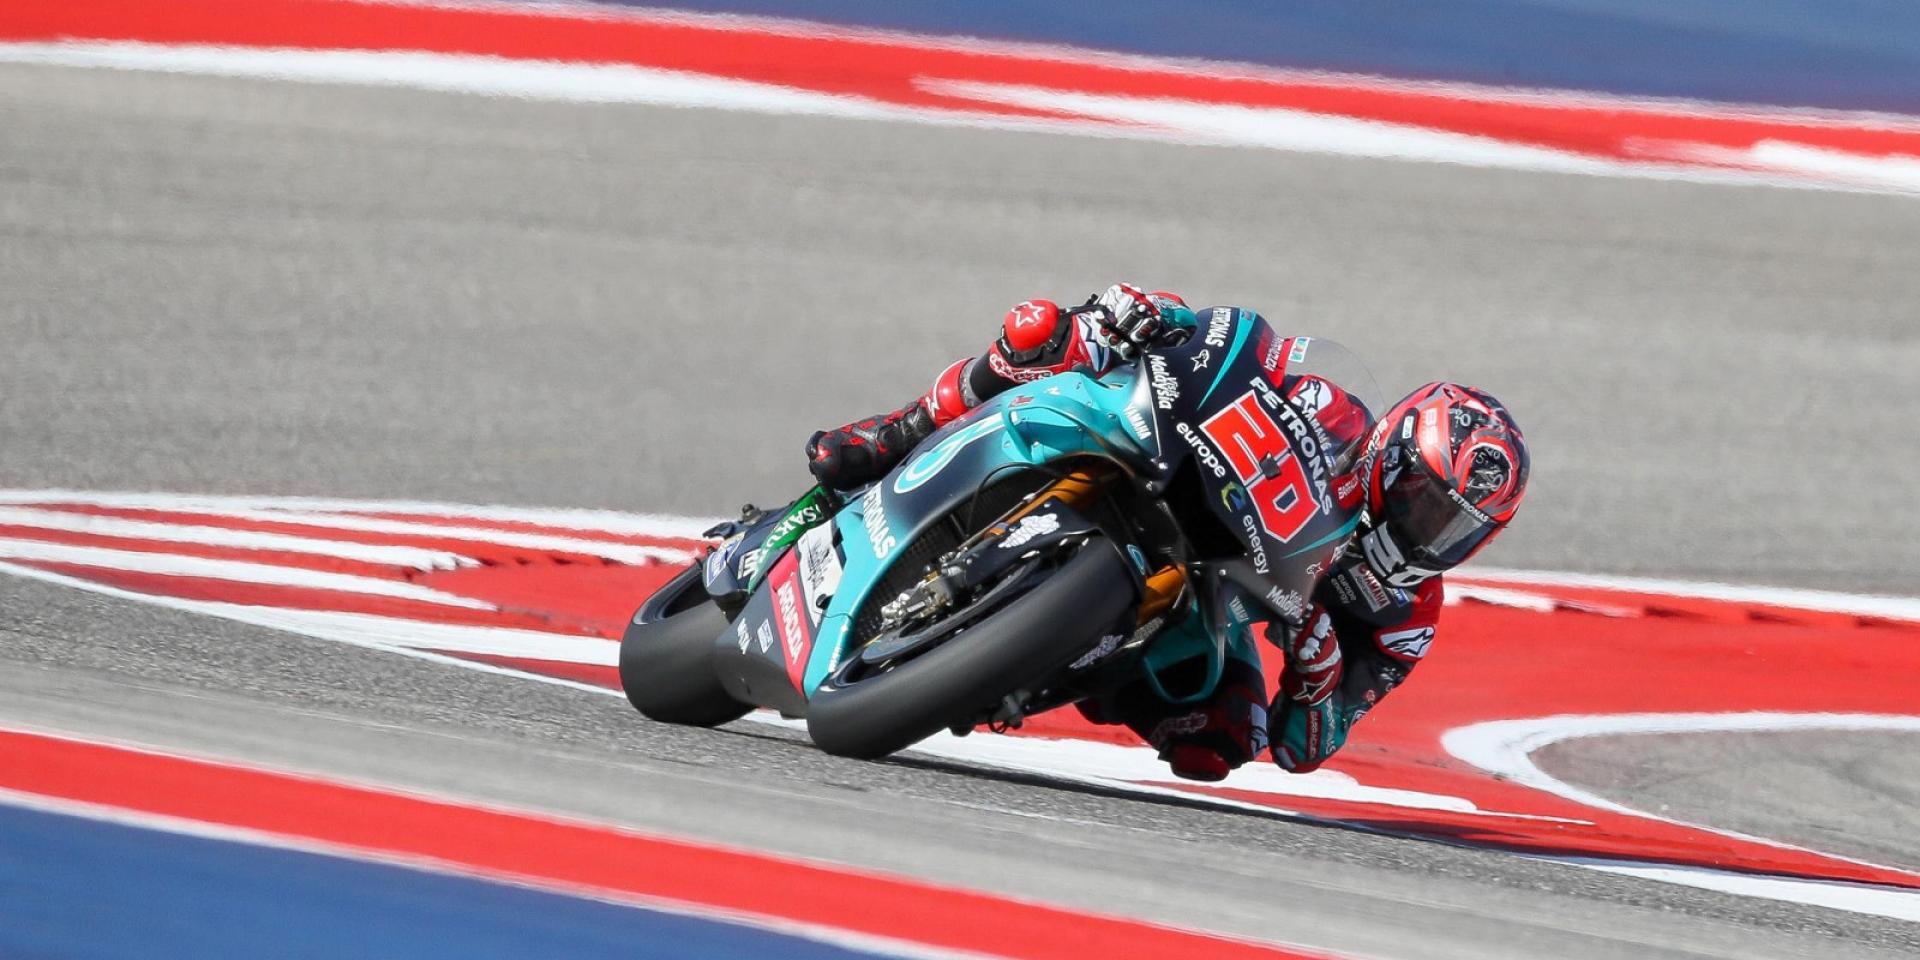 MotoGP阿根廷站、美國站延後,卡達二連戰、葡萄牙替補上陣!